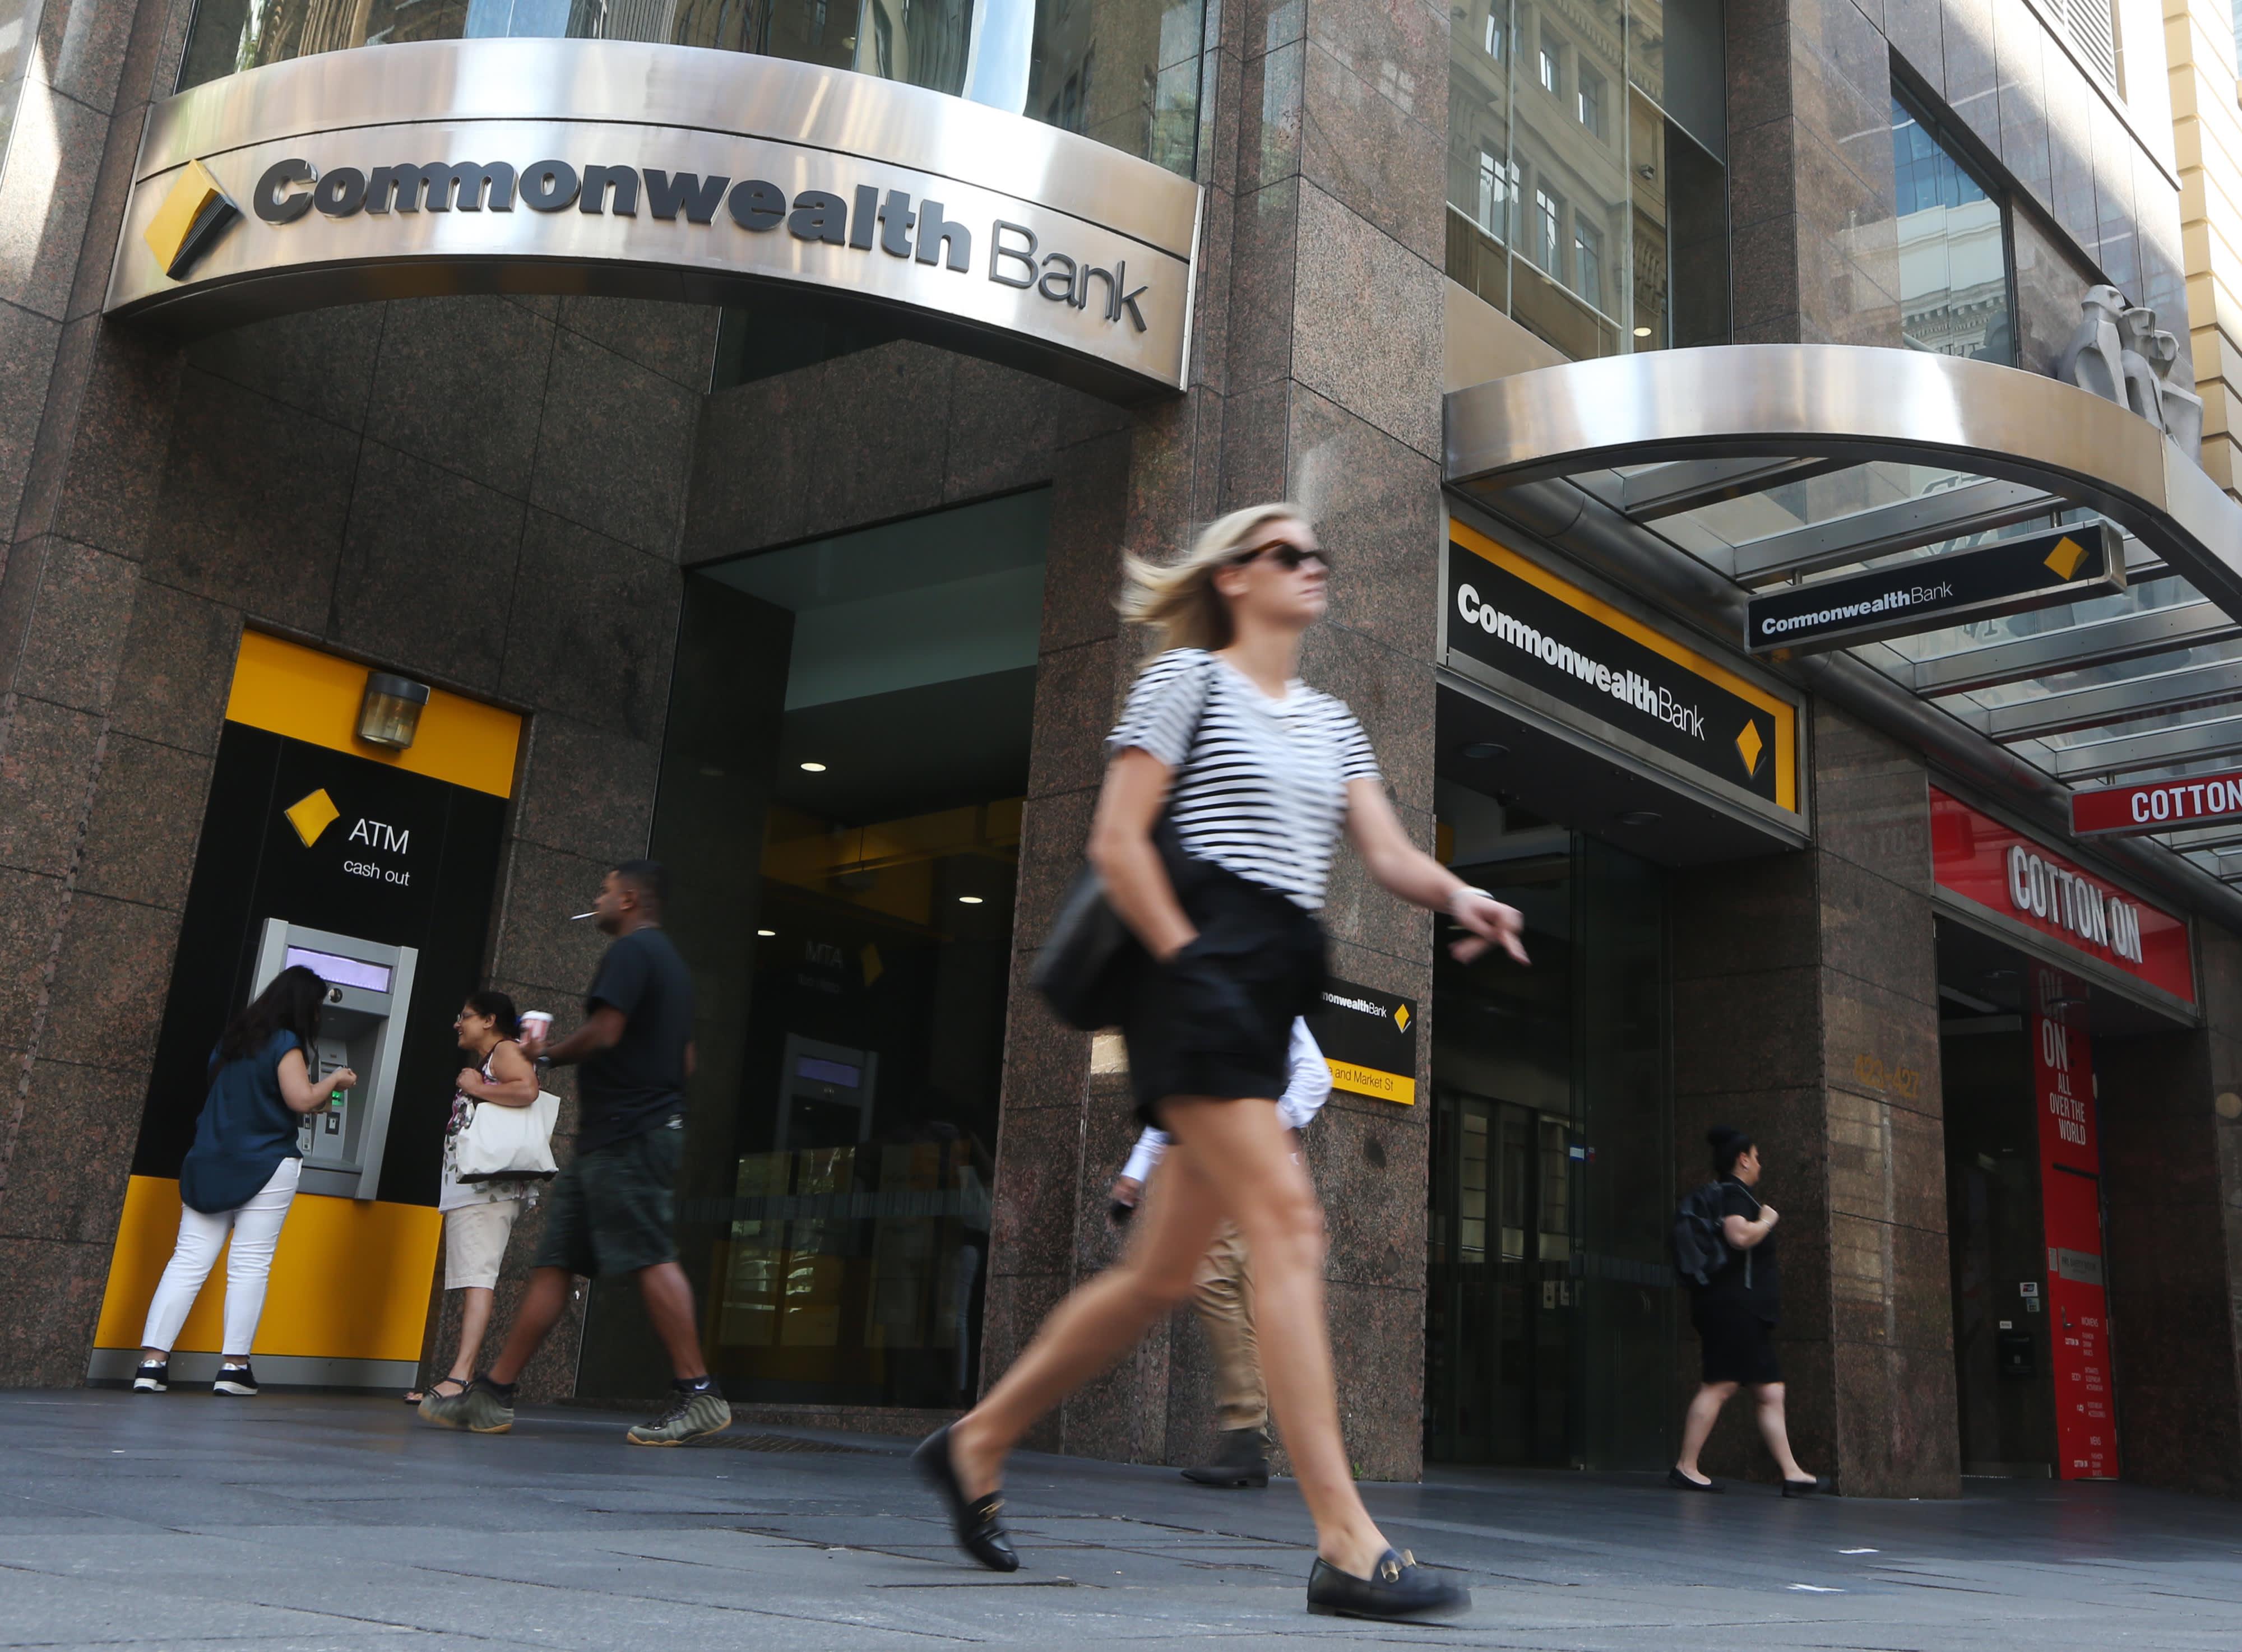 GP: Commonwealth Bank of Australia 190327 ASIA